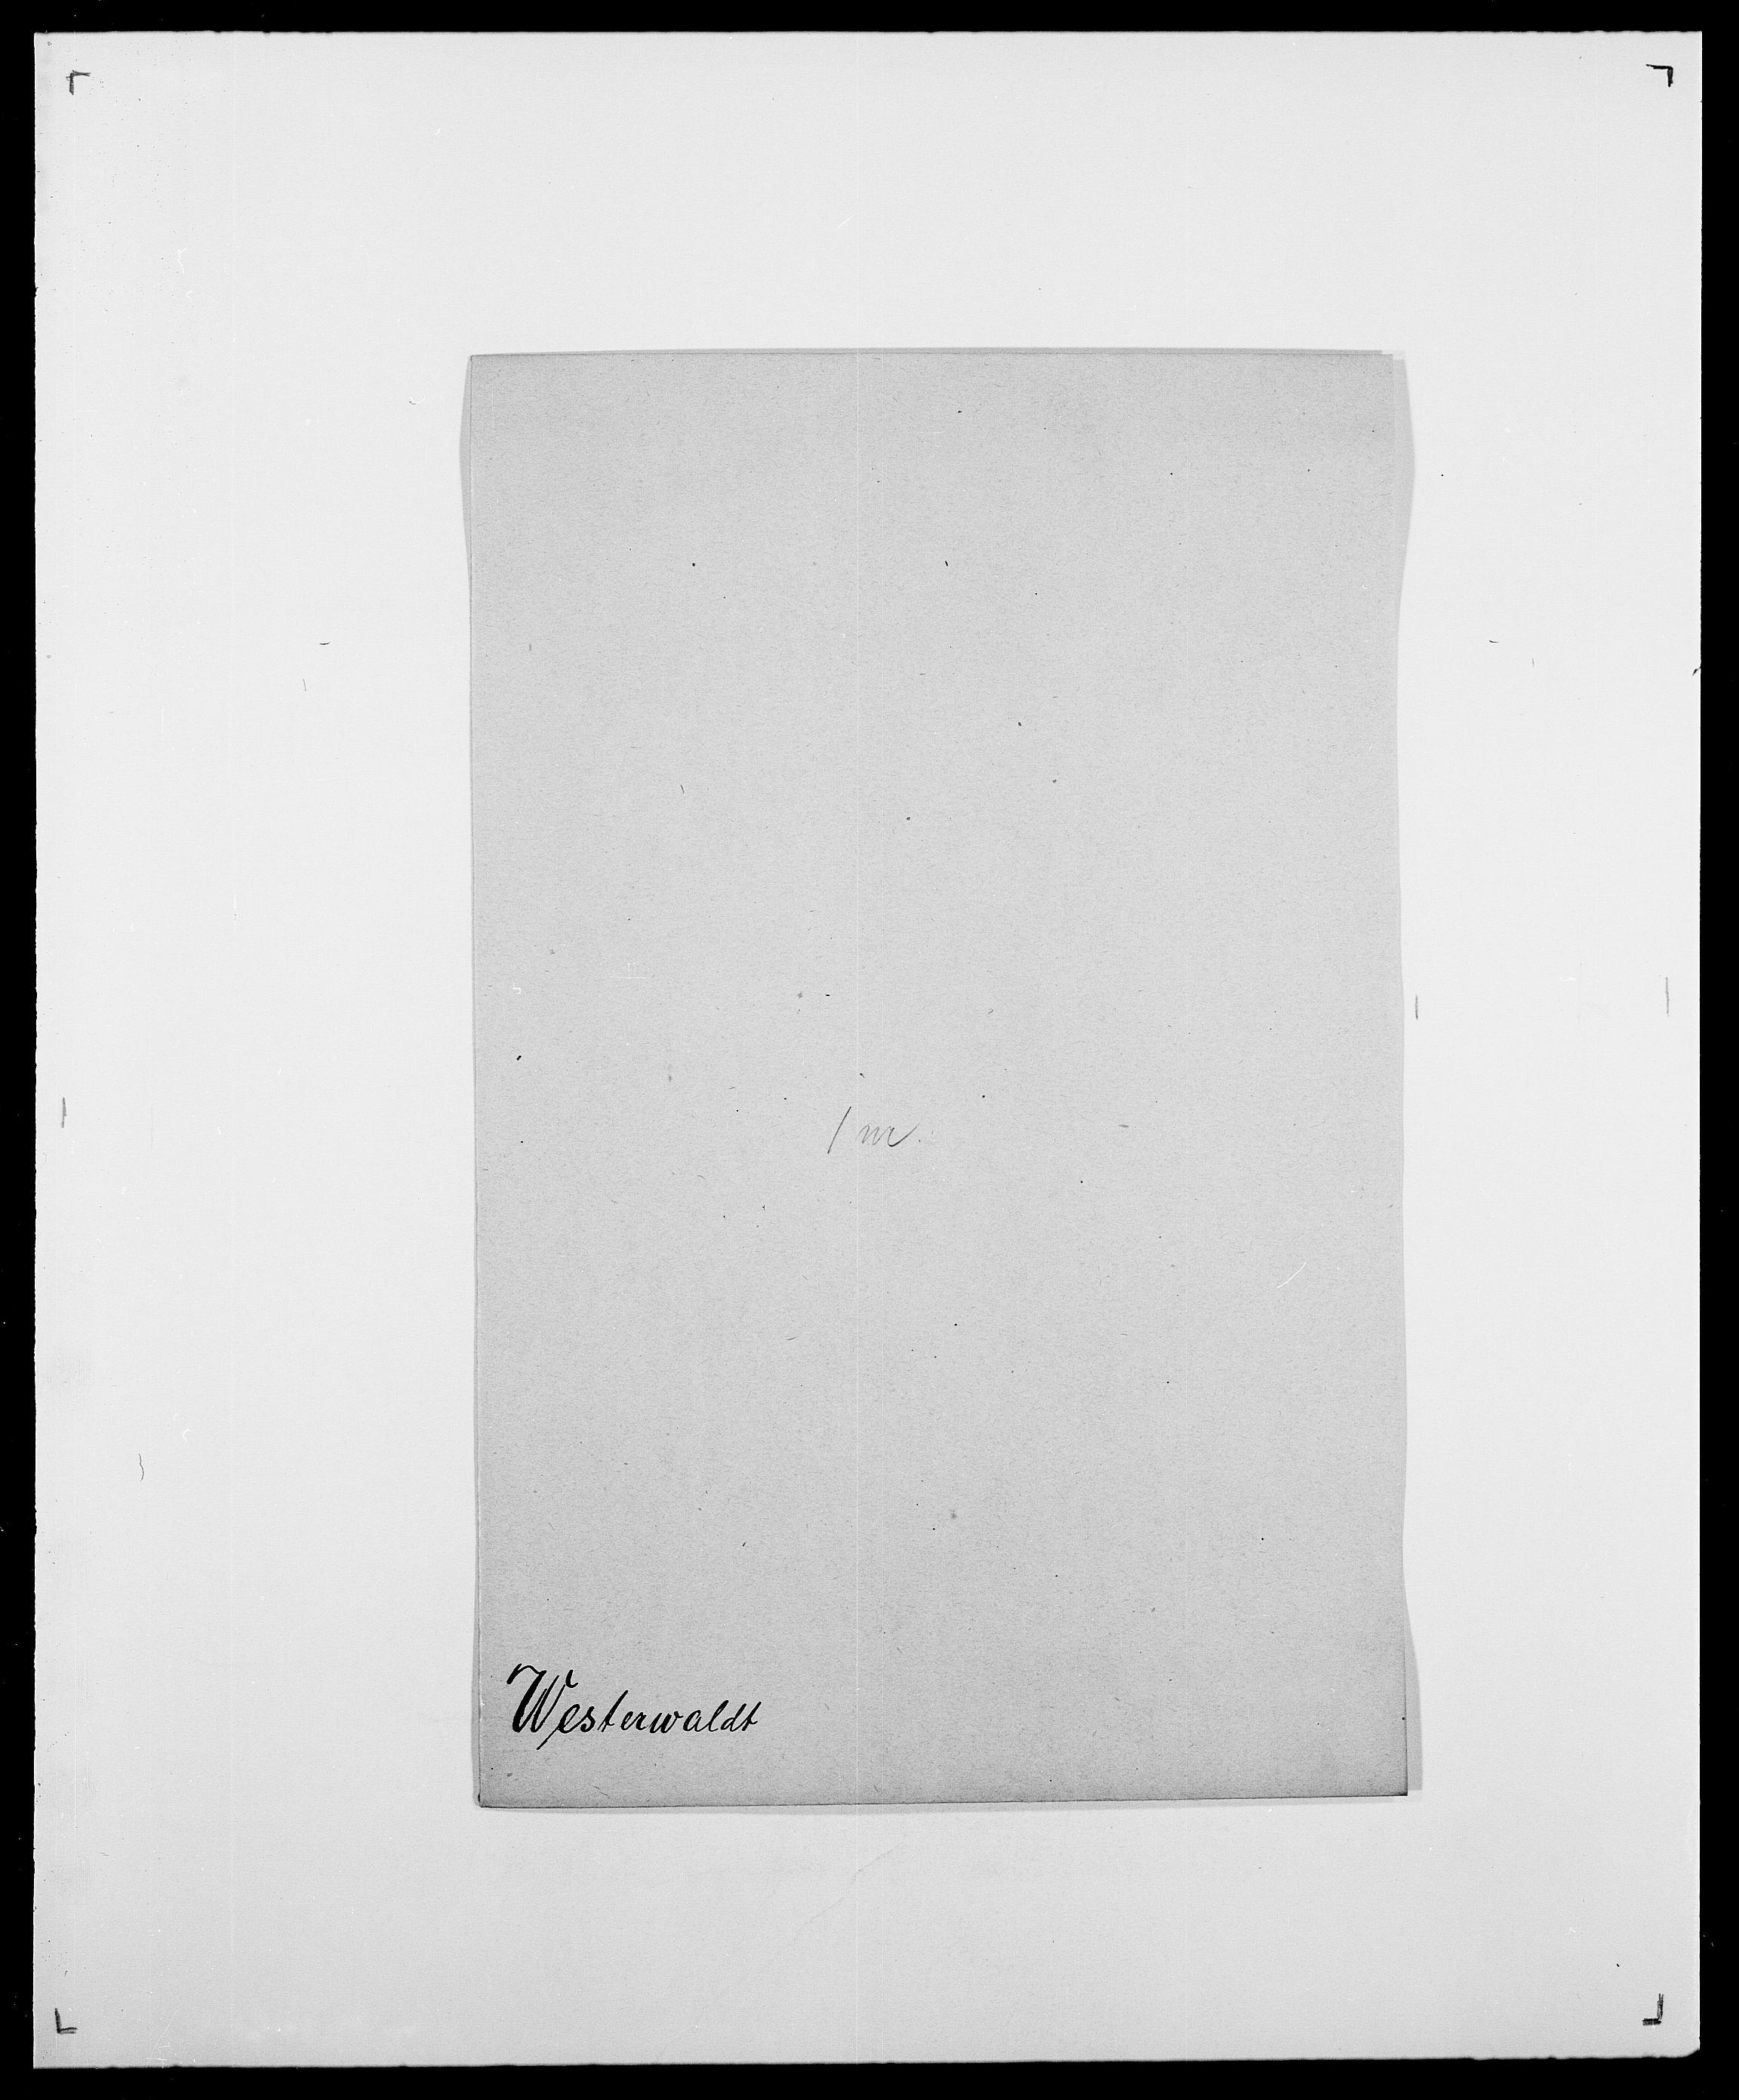 SAO, Delgobe, Charles Antoine - samling, D/Da/L0041: Vemmestad - Viker, s. 291